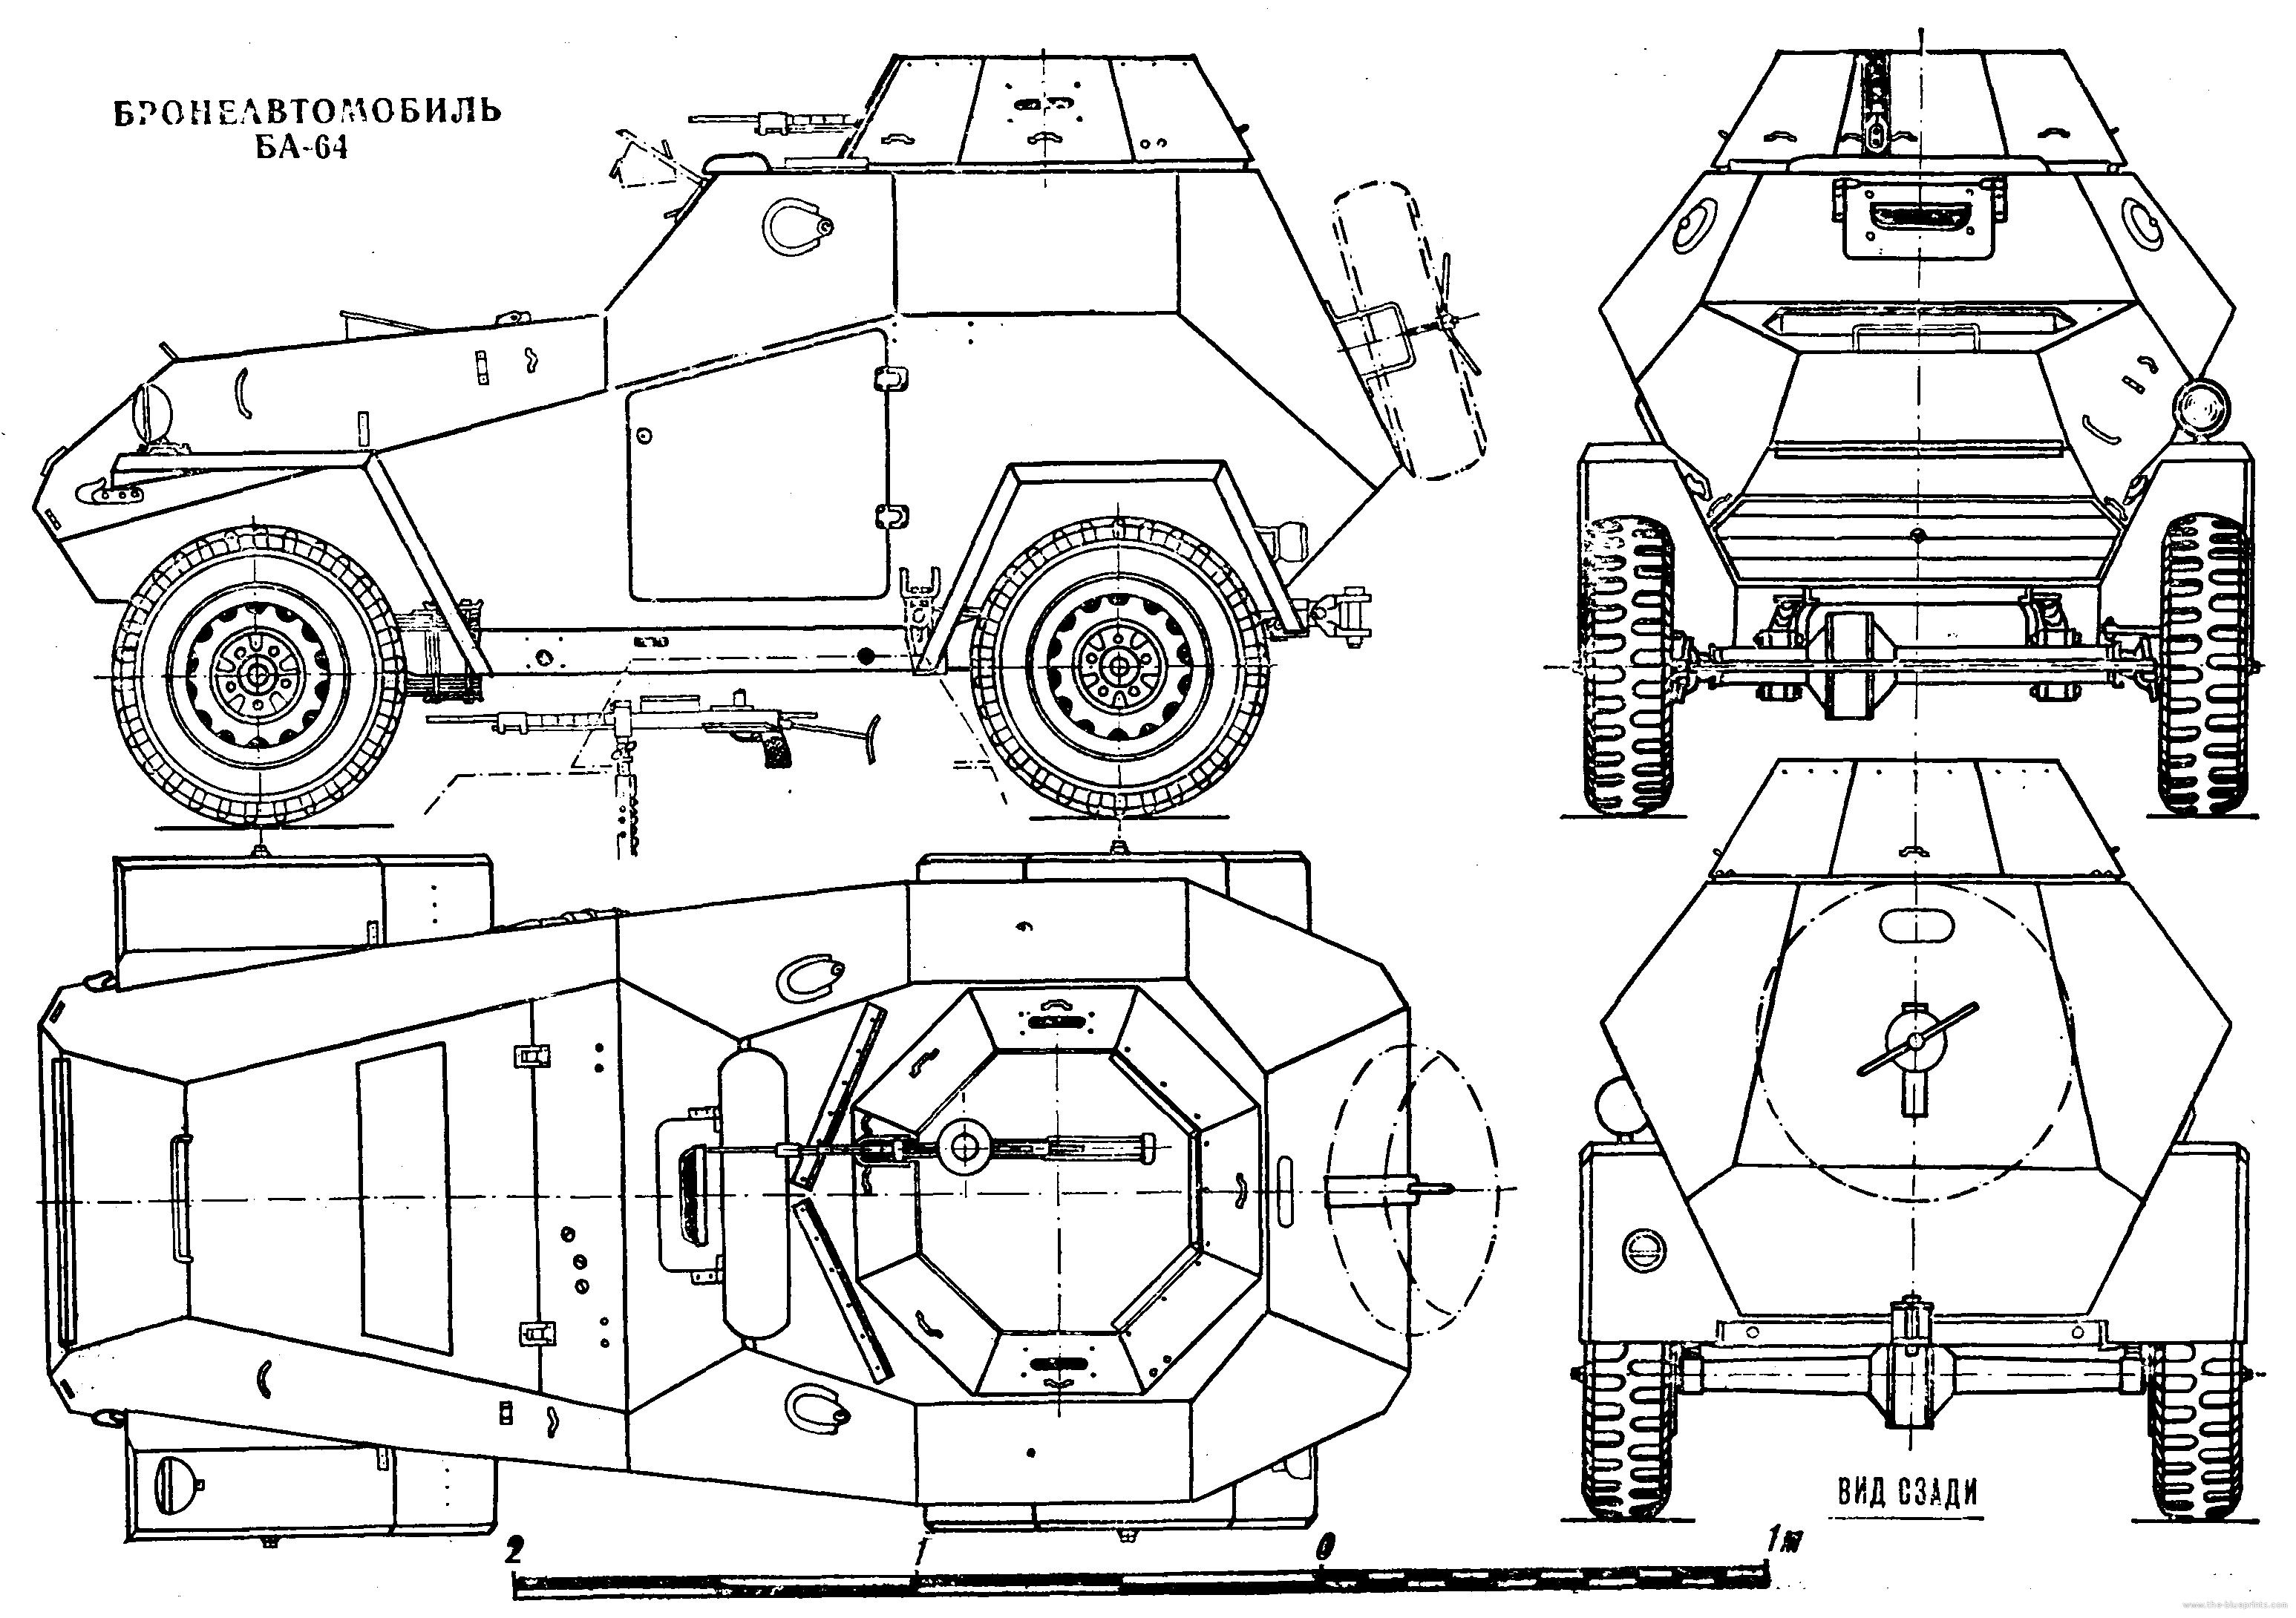 Pin On Cutaways Blueprints